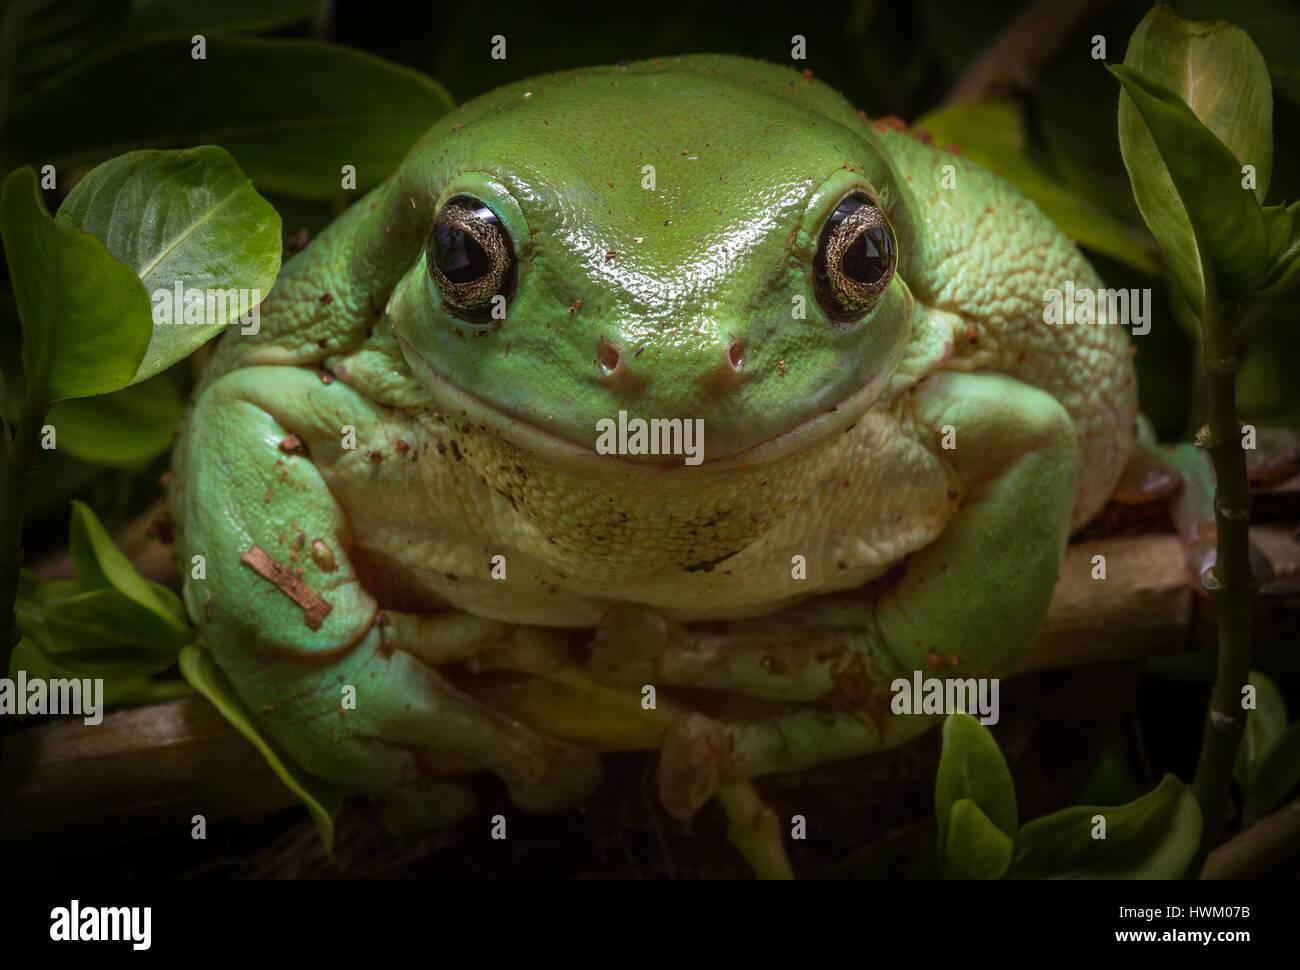 Green Tree Frog (Litoria caerulea) Stock Photo